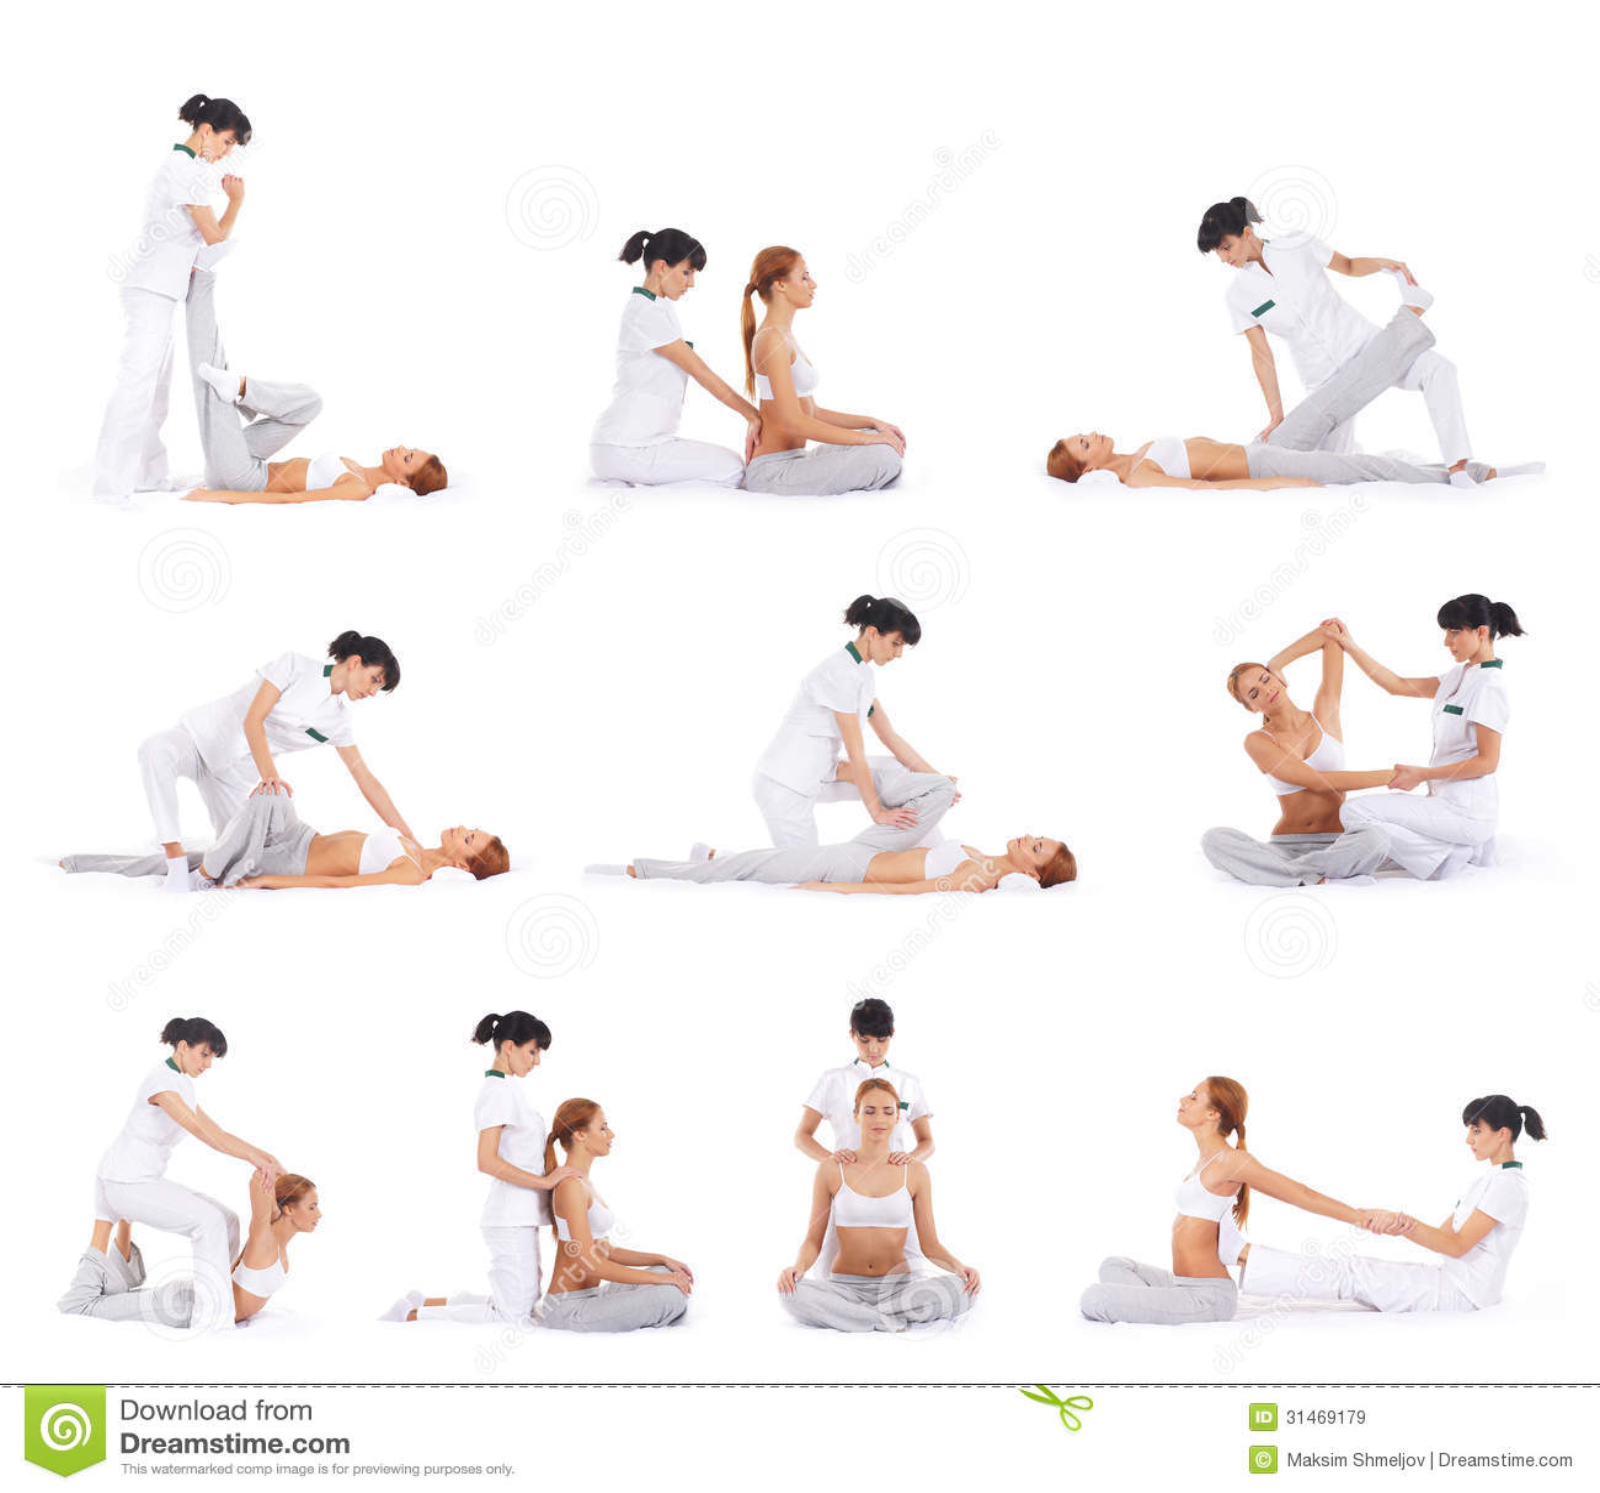 Young women on a Thai massage procedure